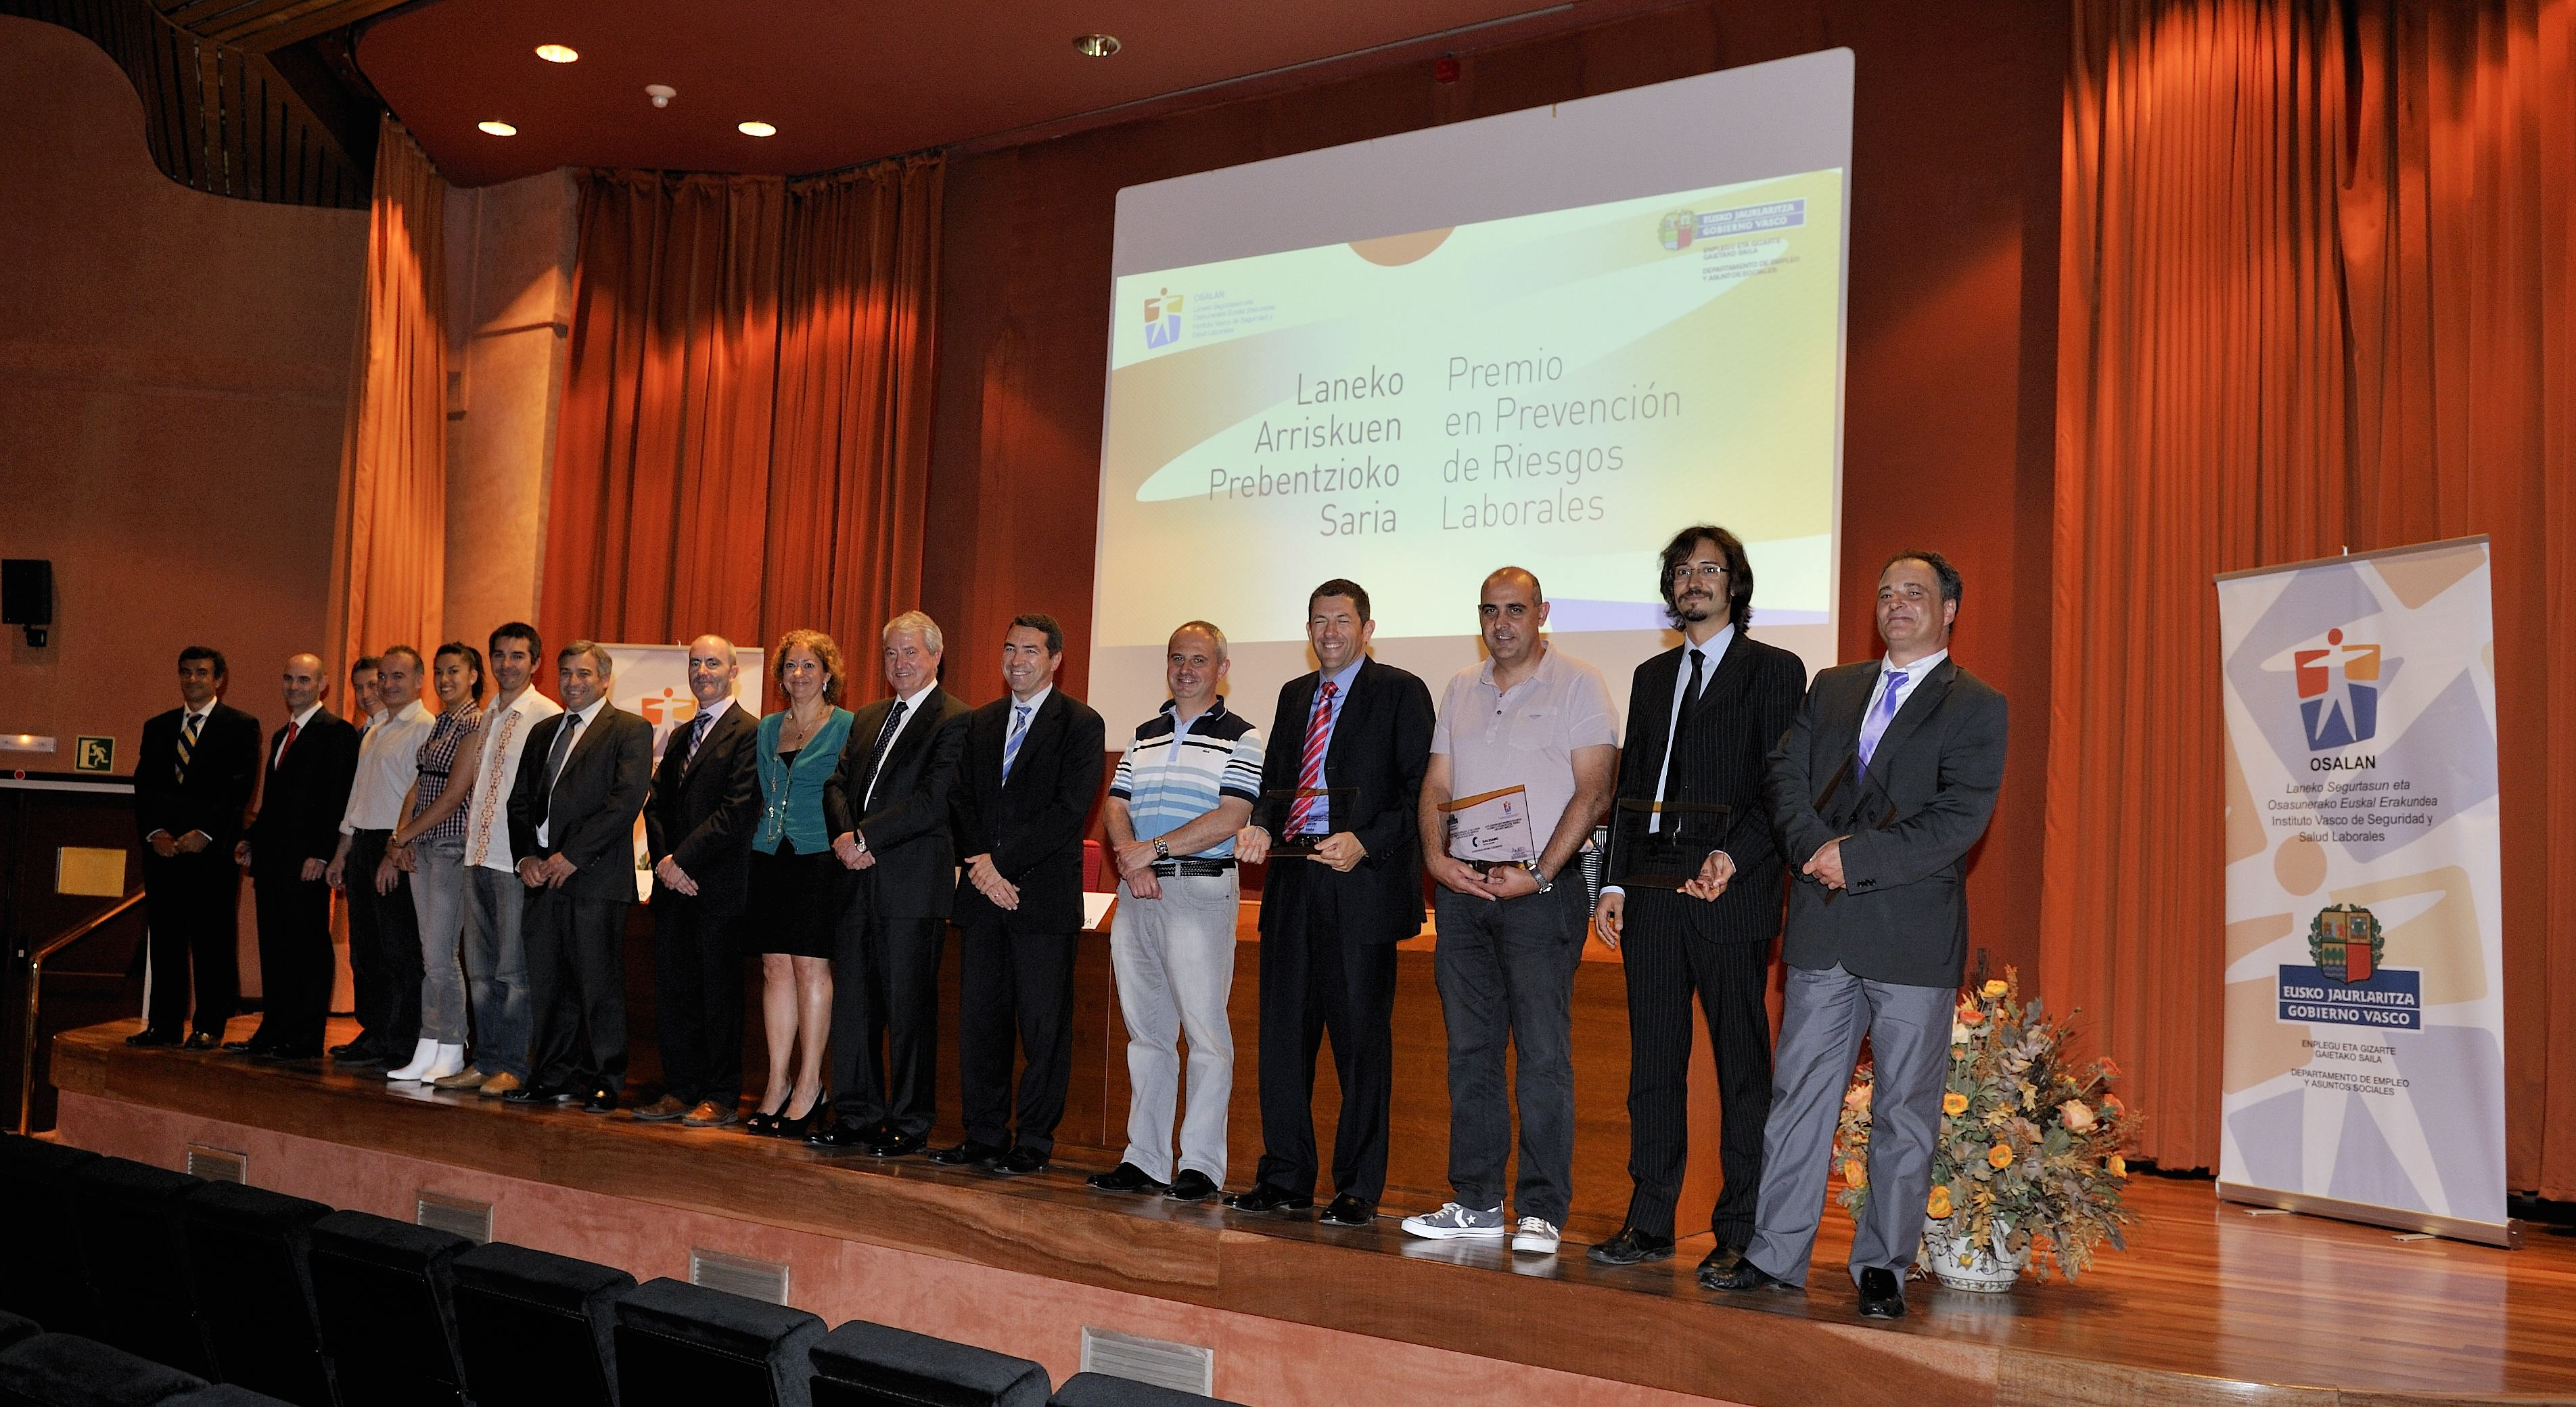 premios_osalan7.jpg